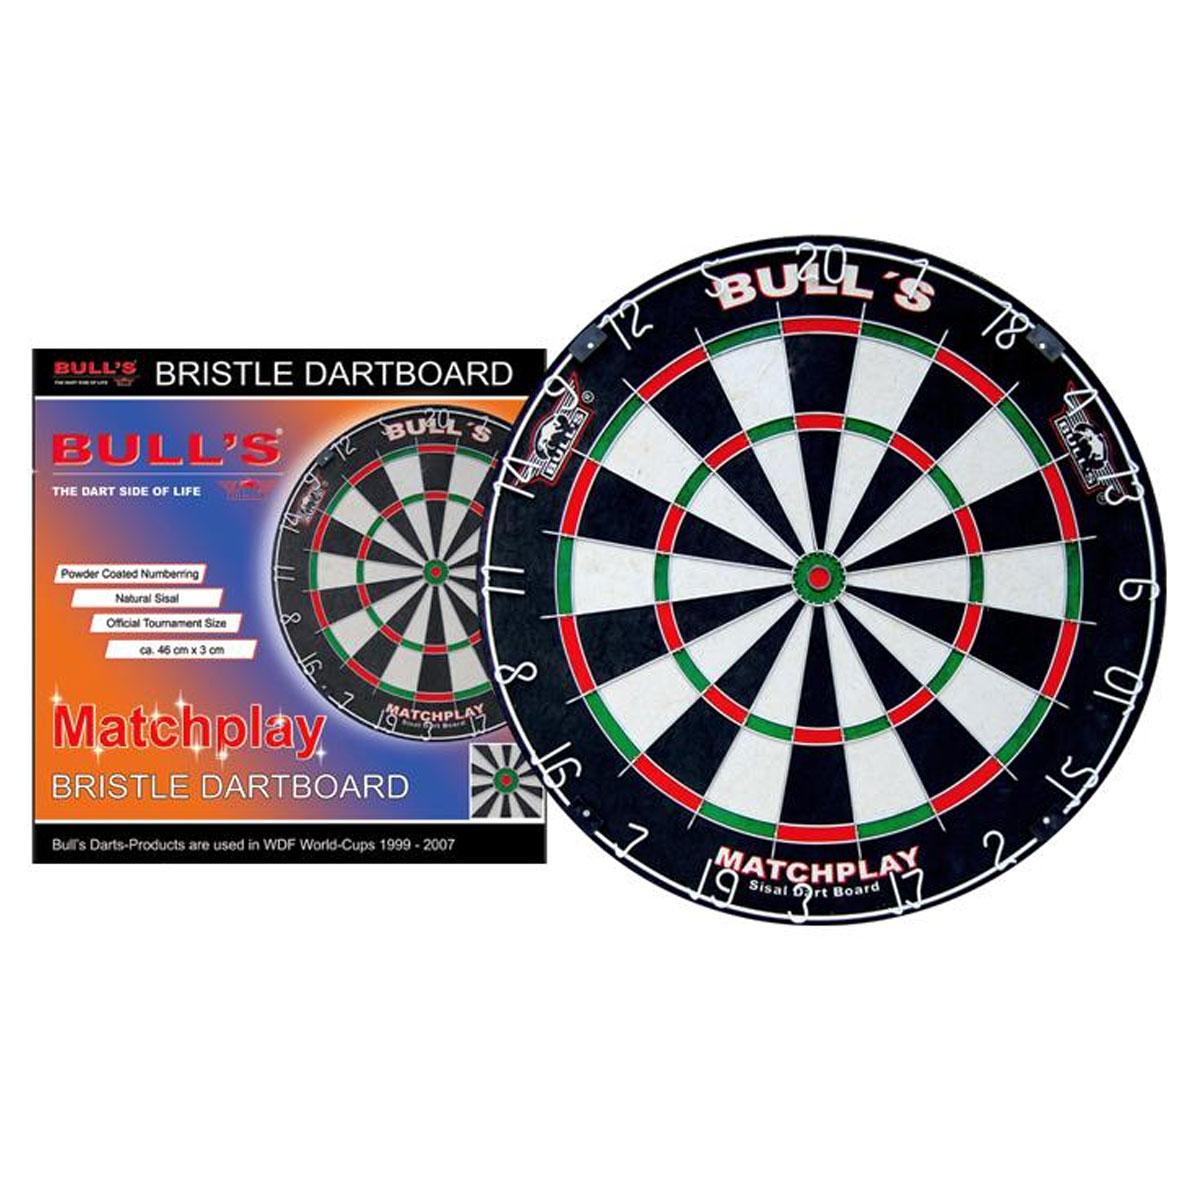 "Мишень для дартс Bull's ""Matchplay Bristle Board"", 46 см х 3 см 68230"